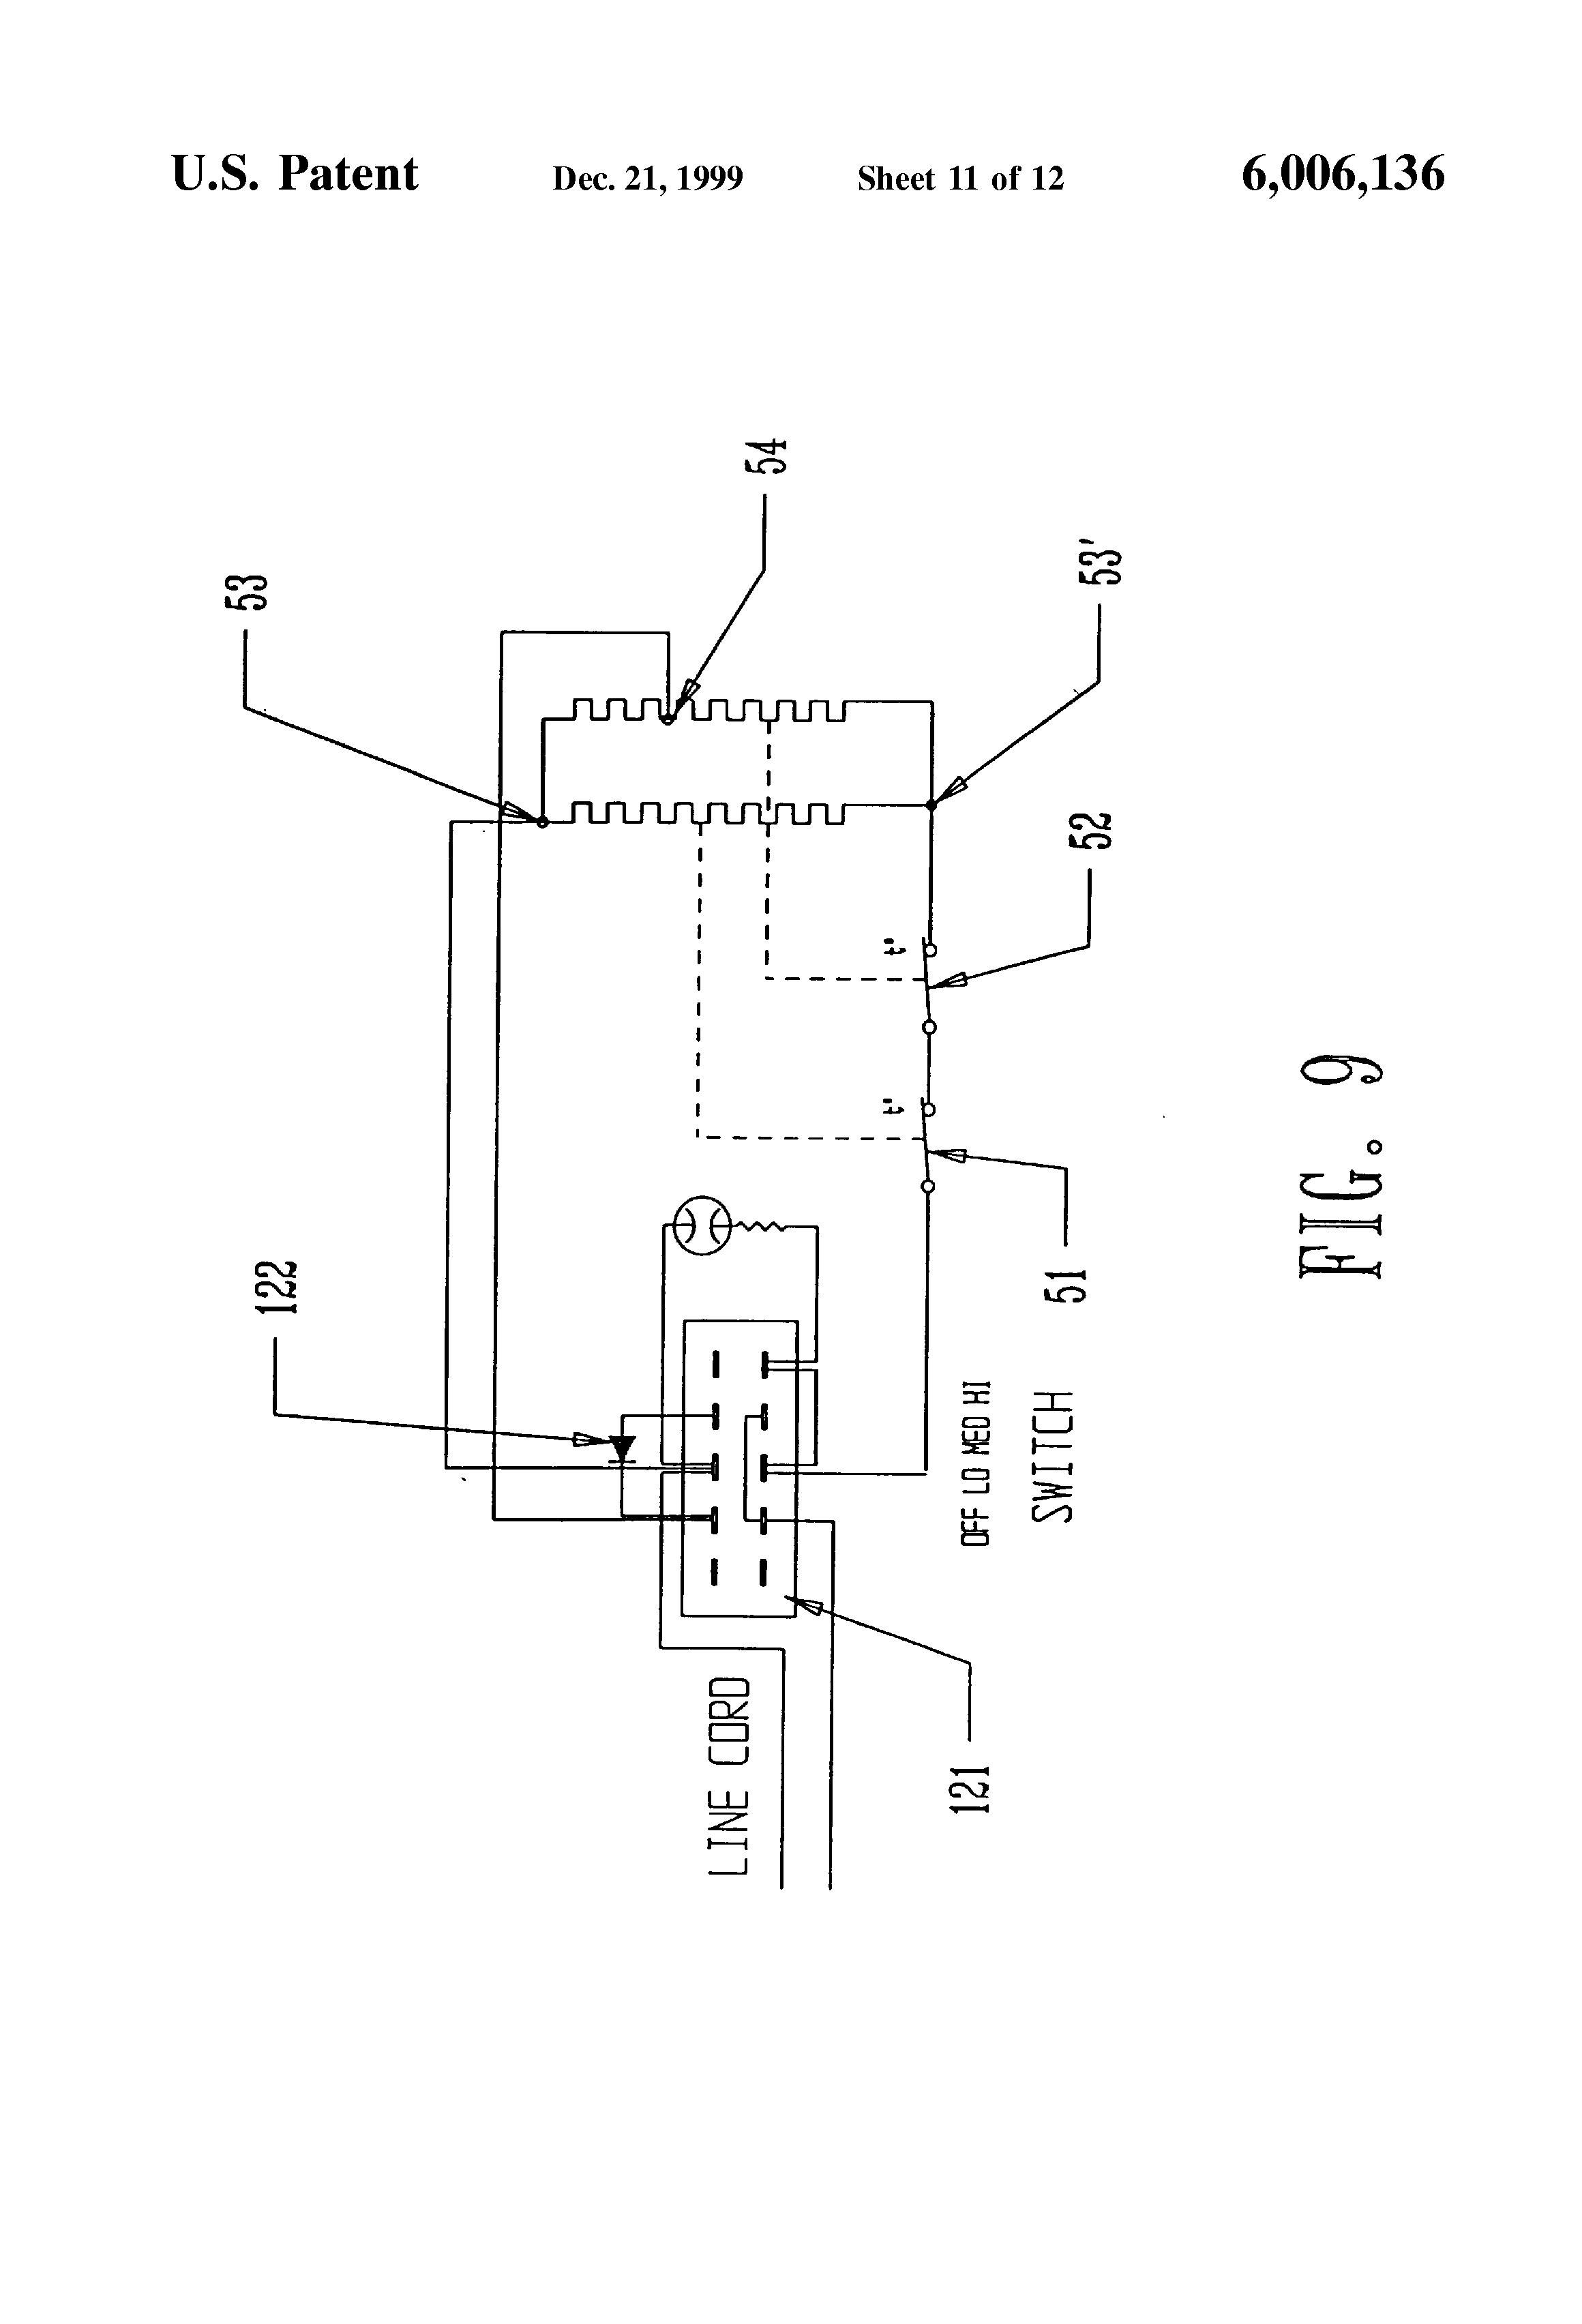 Heating Pad Wiring Diagram : 26 Wiring Diagram Images